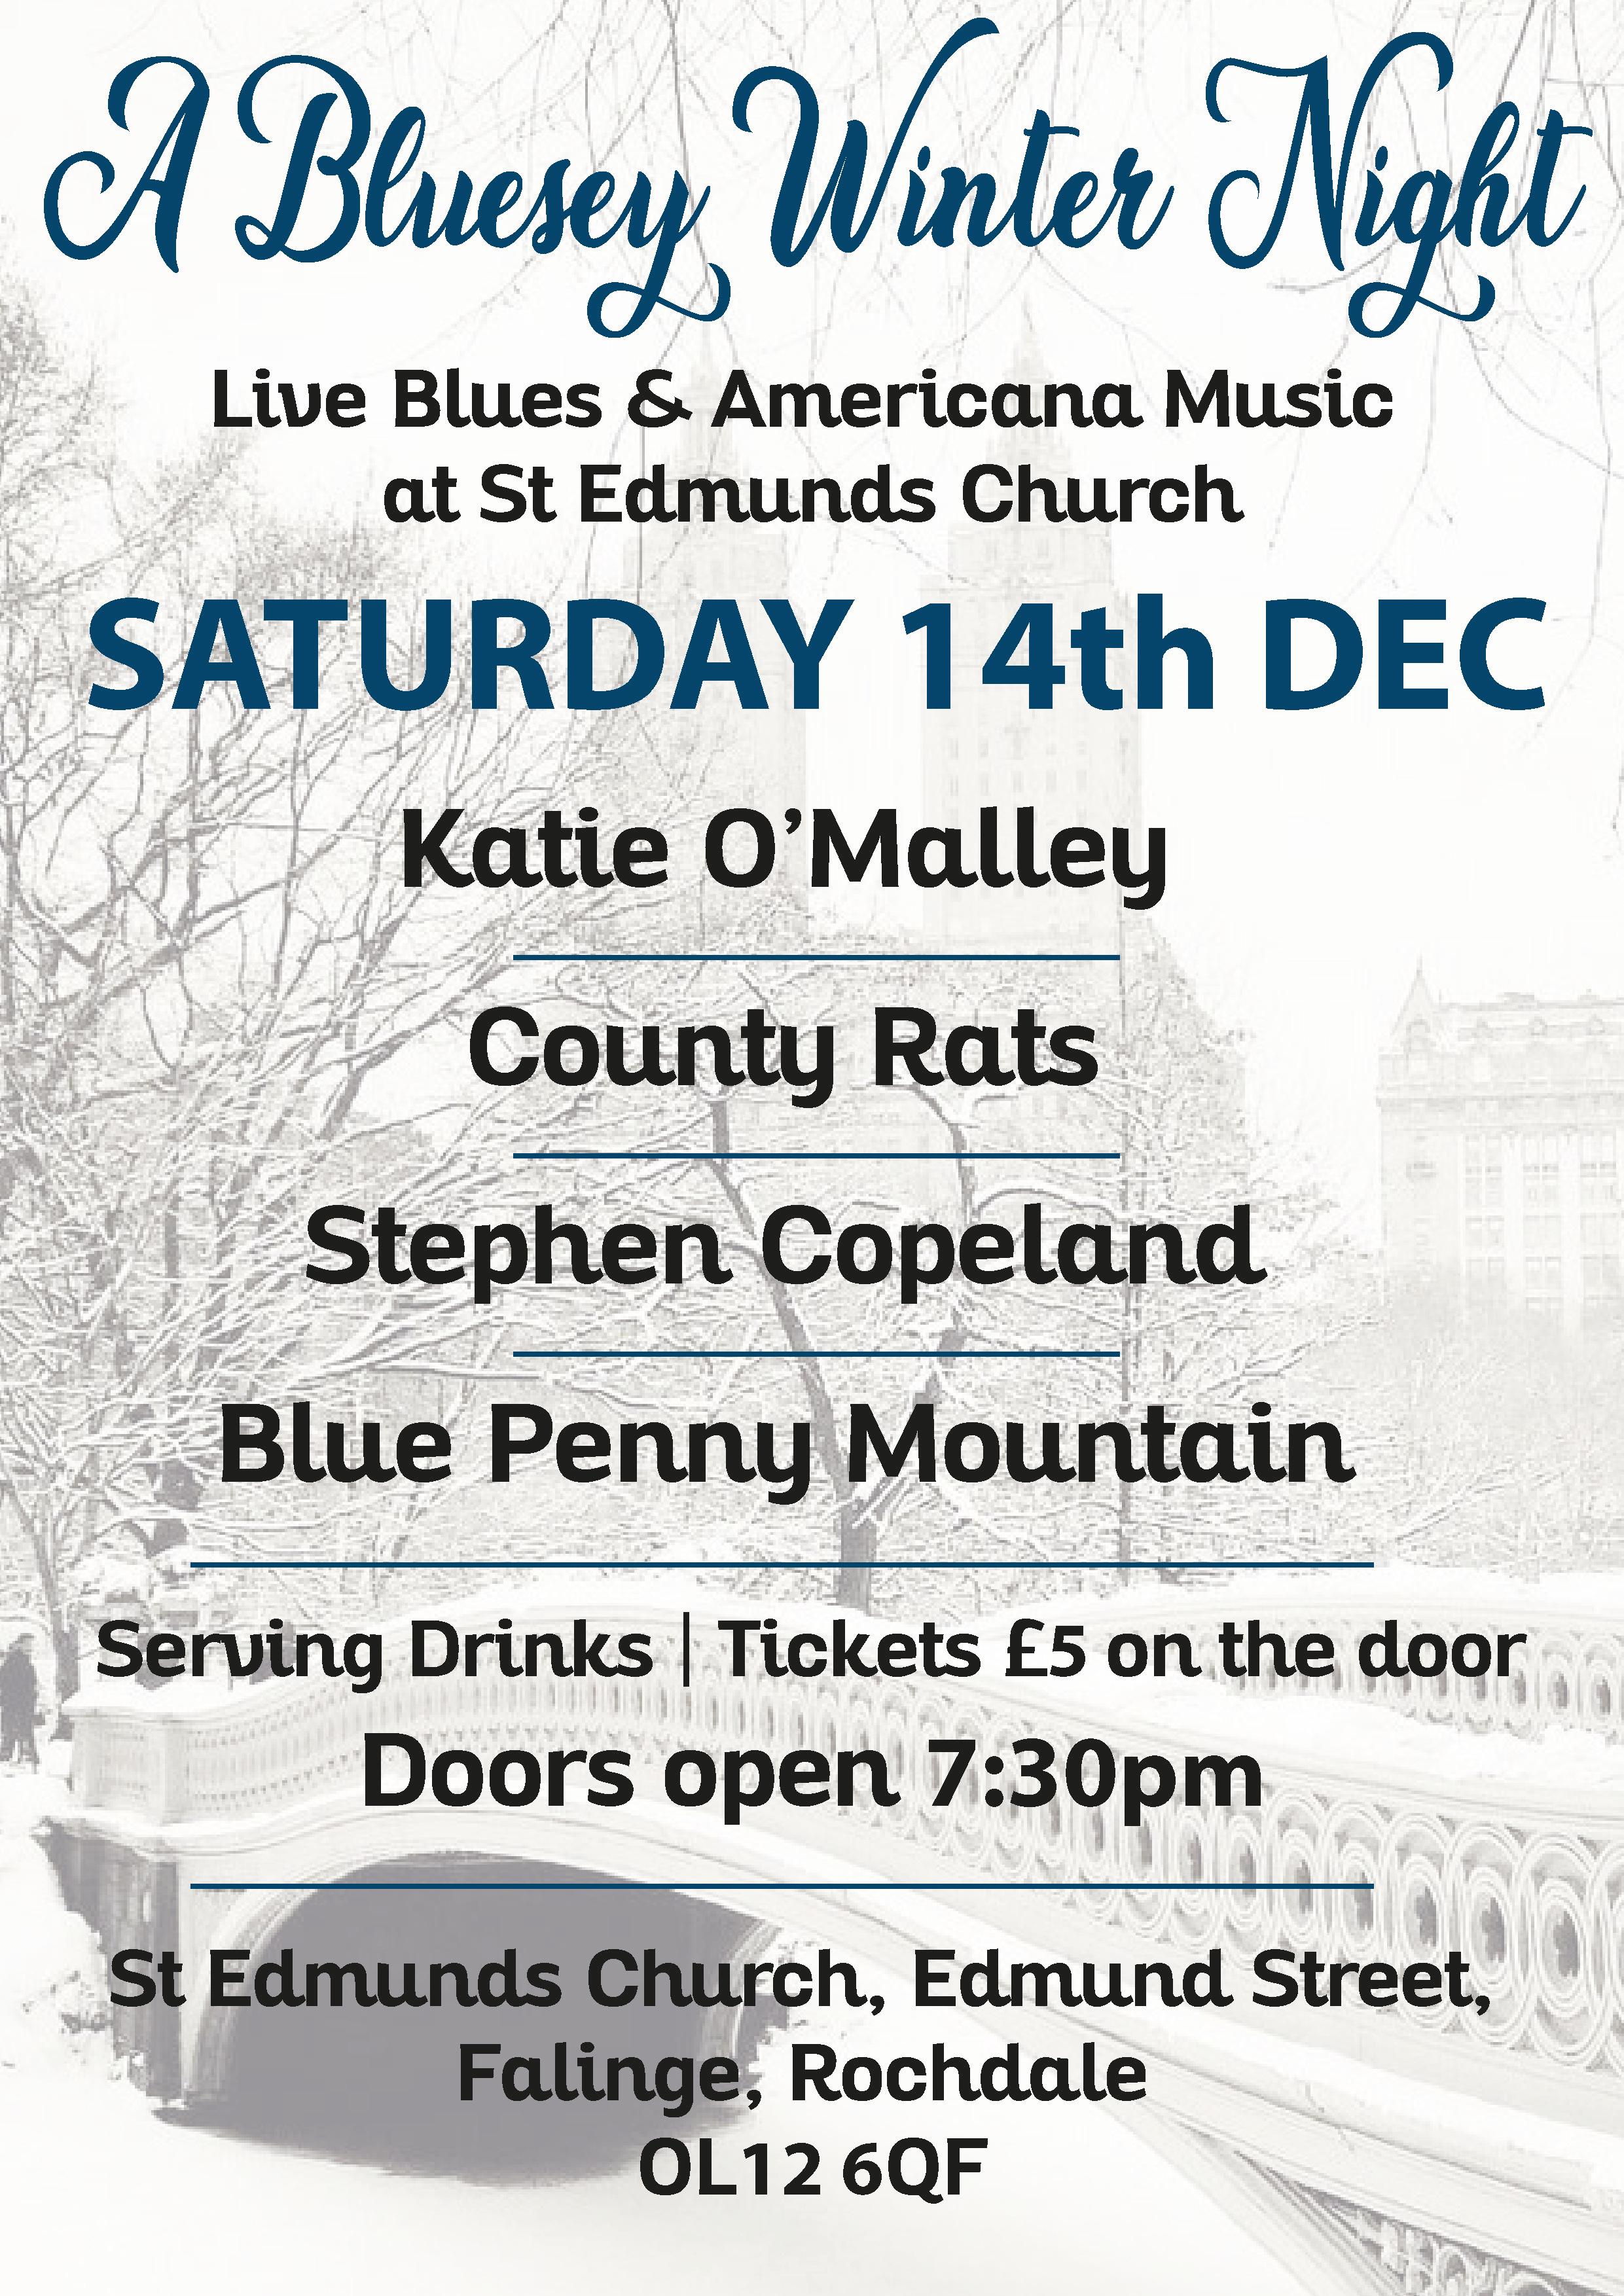 A Bluesy Winter Night - Katie O'Malley at St Edmunds Church